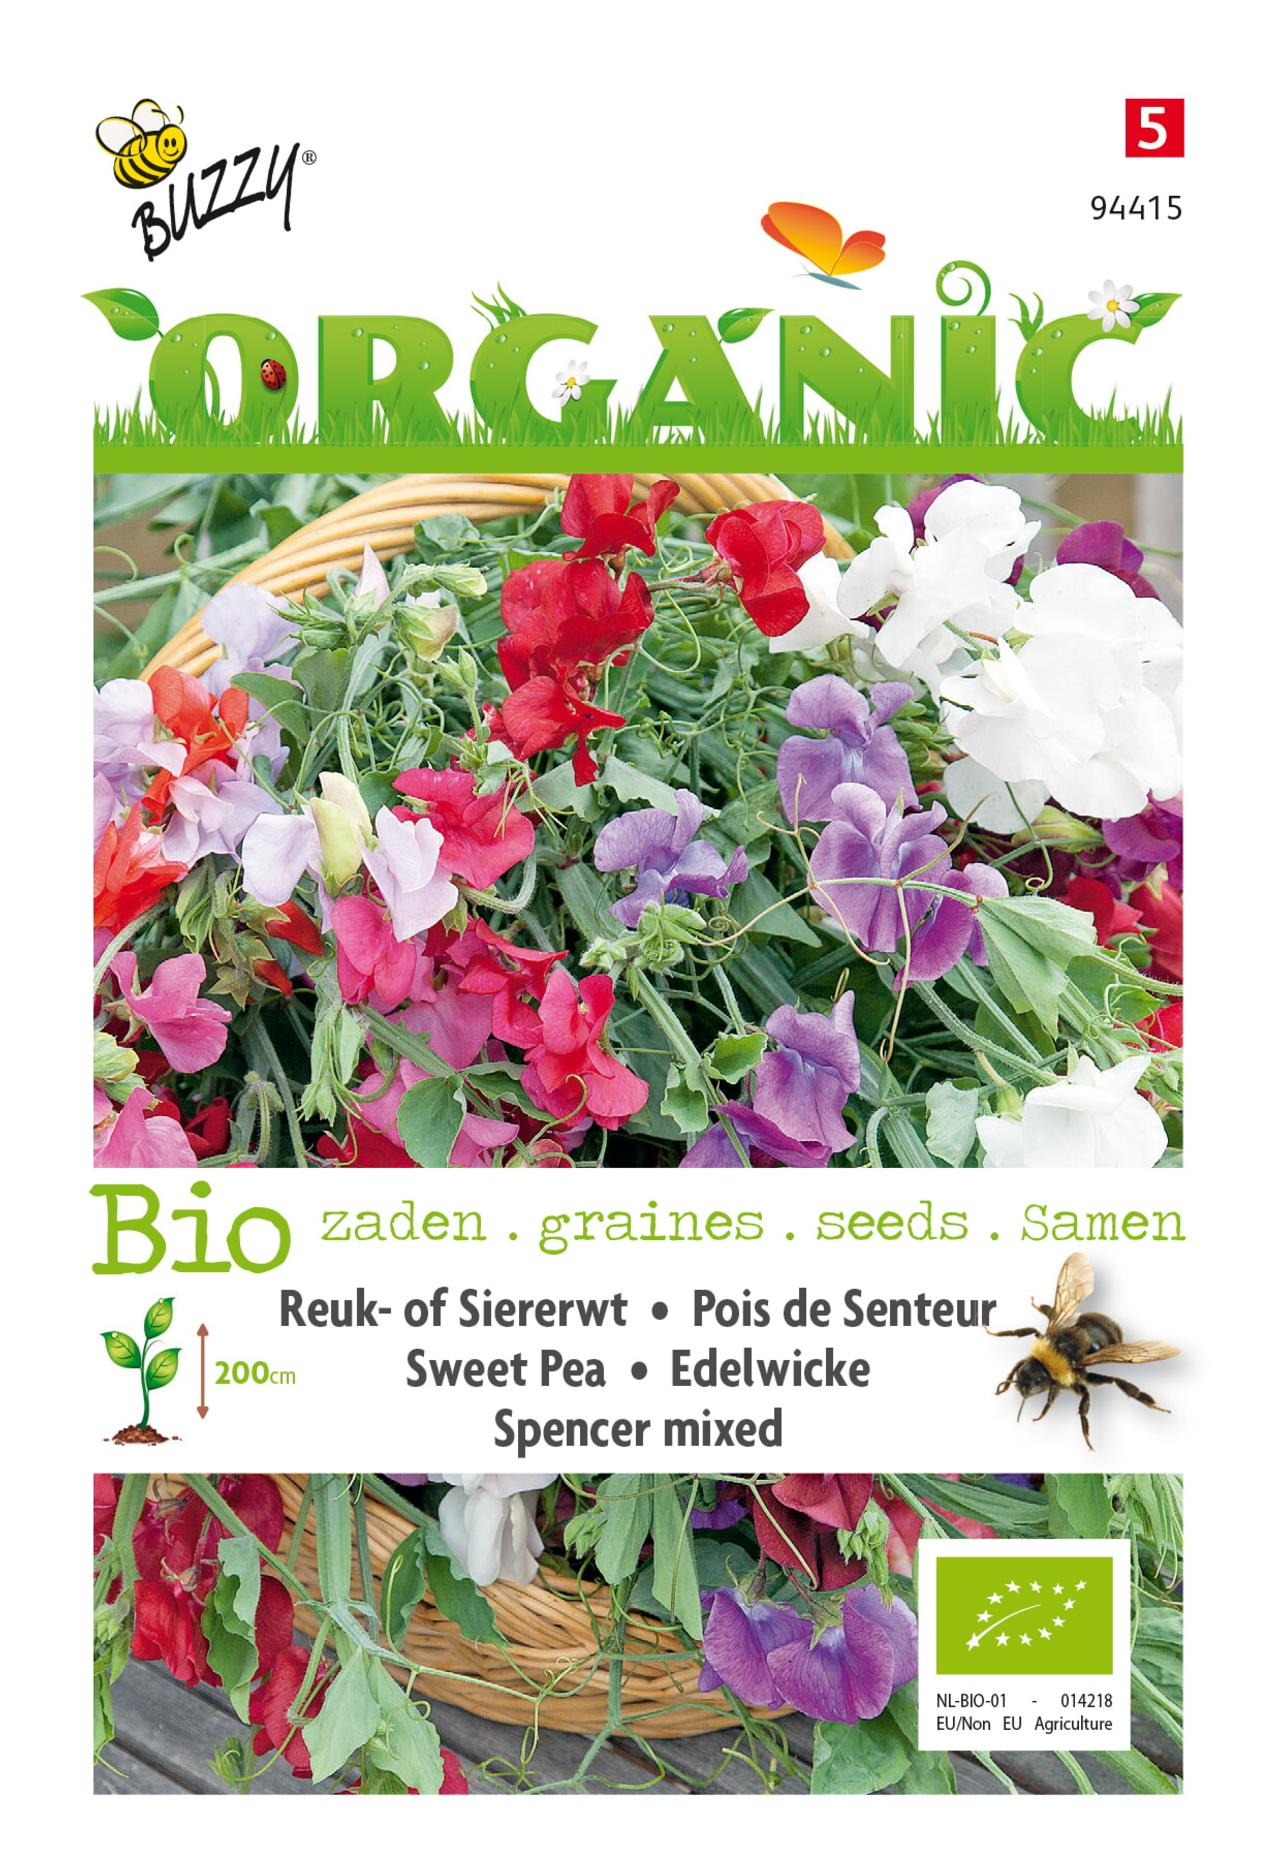 Lathyrus odoratus 'Spencer' (BIO) plant